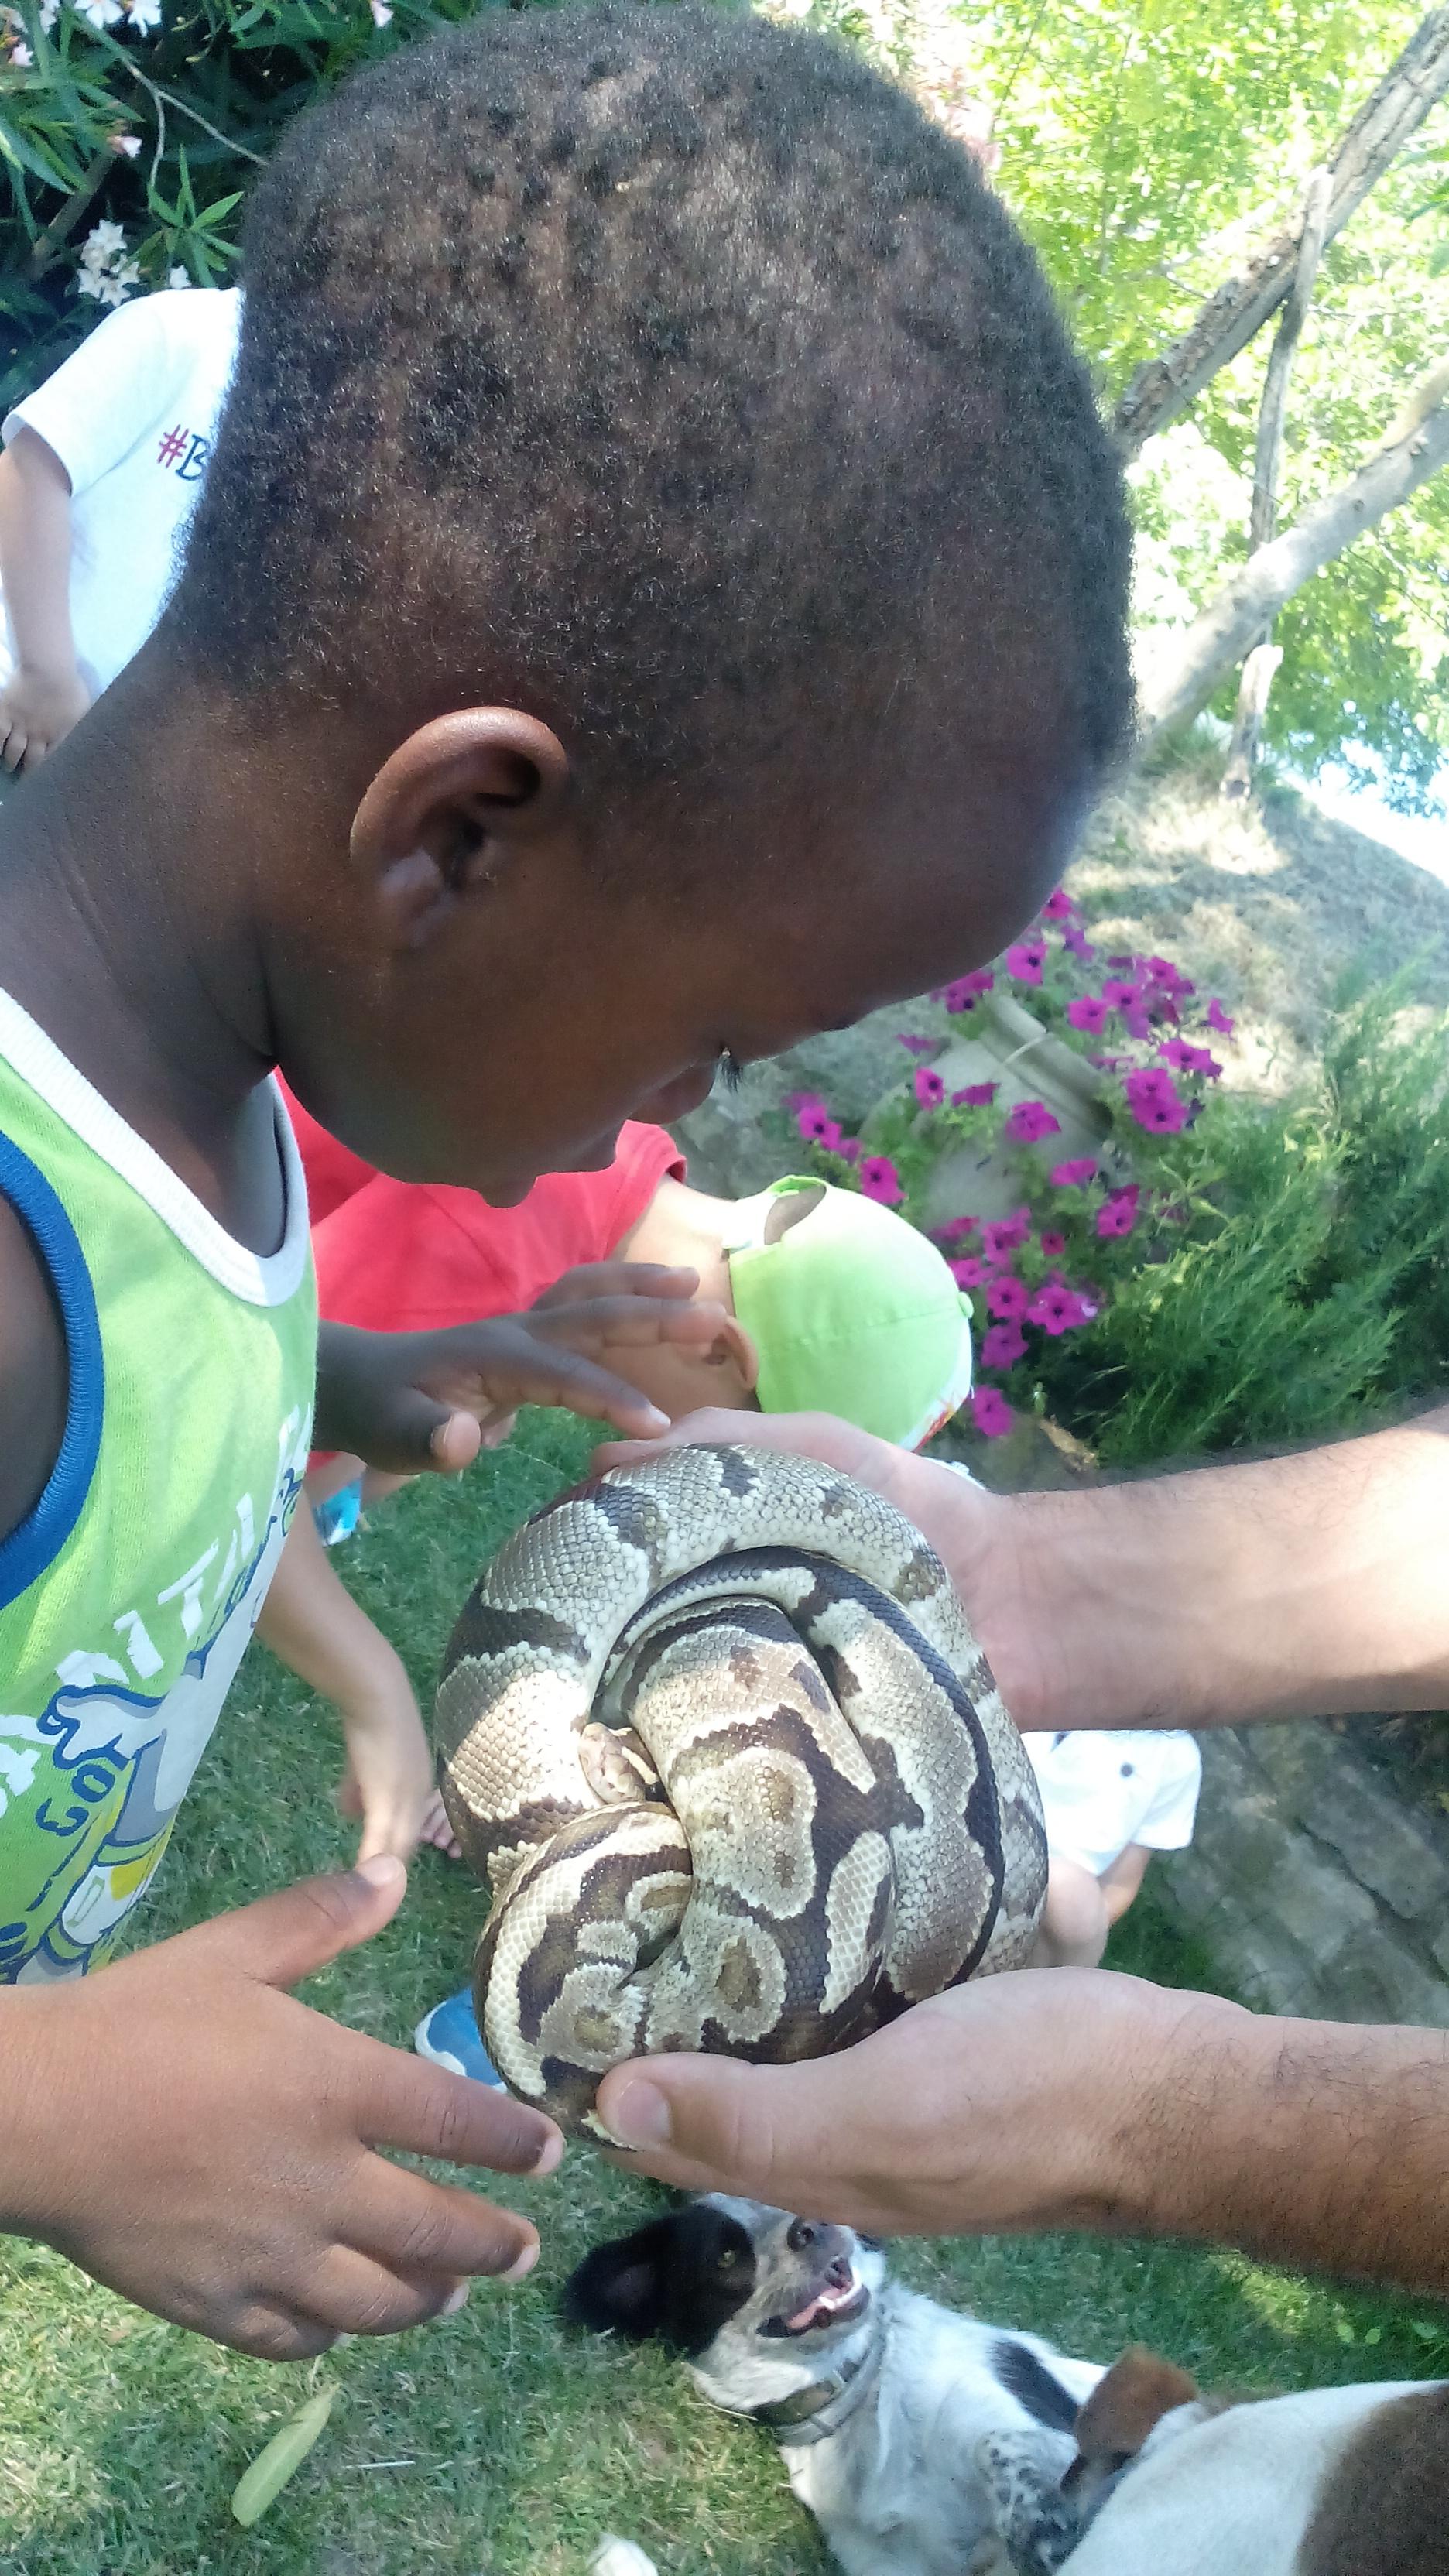 wpid img 20150701 102023 Bambini e Animali